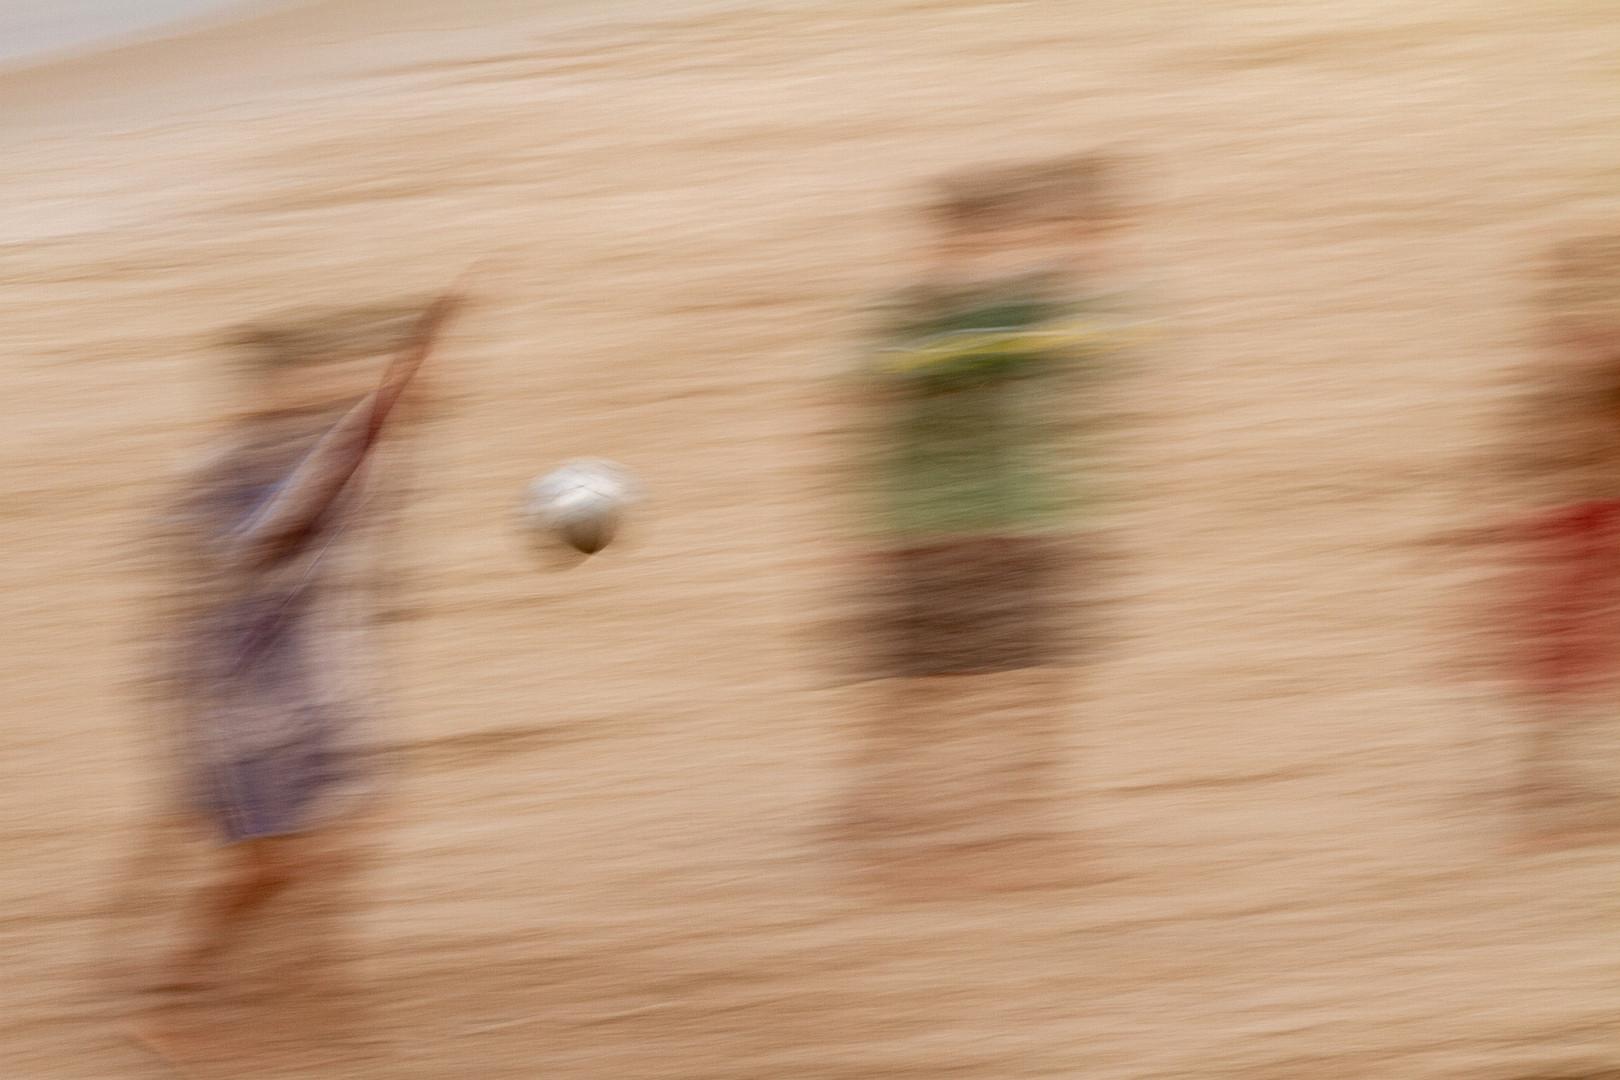 Brazil, beach & soccer